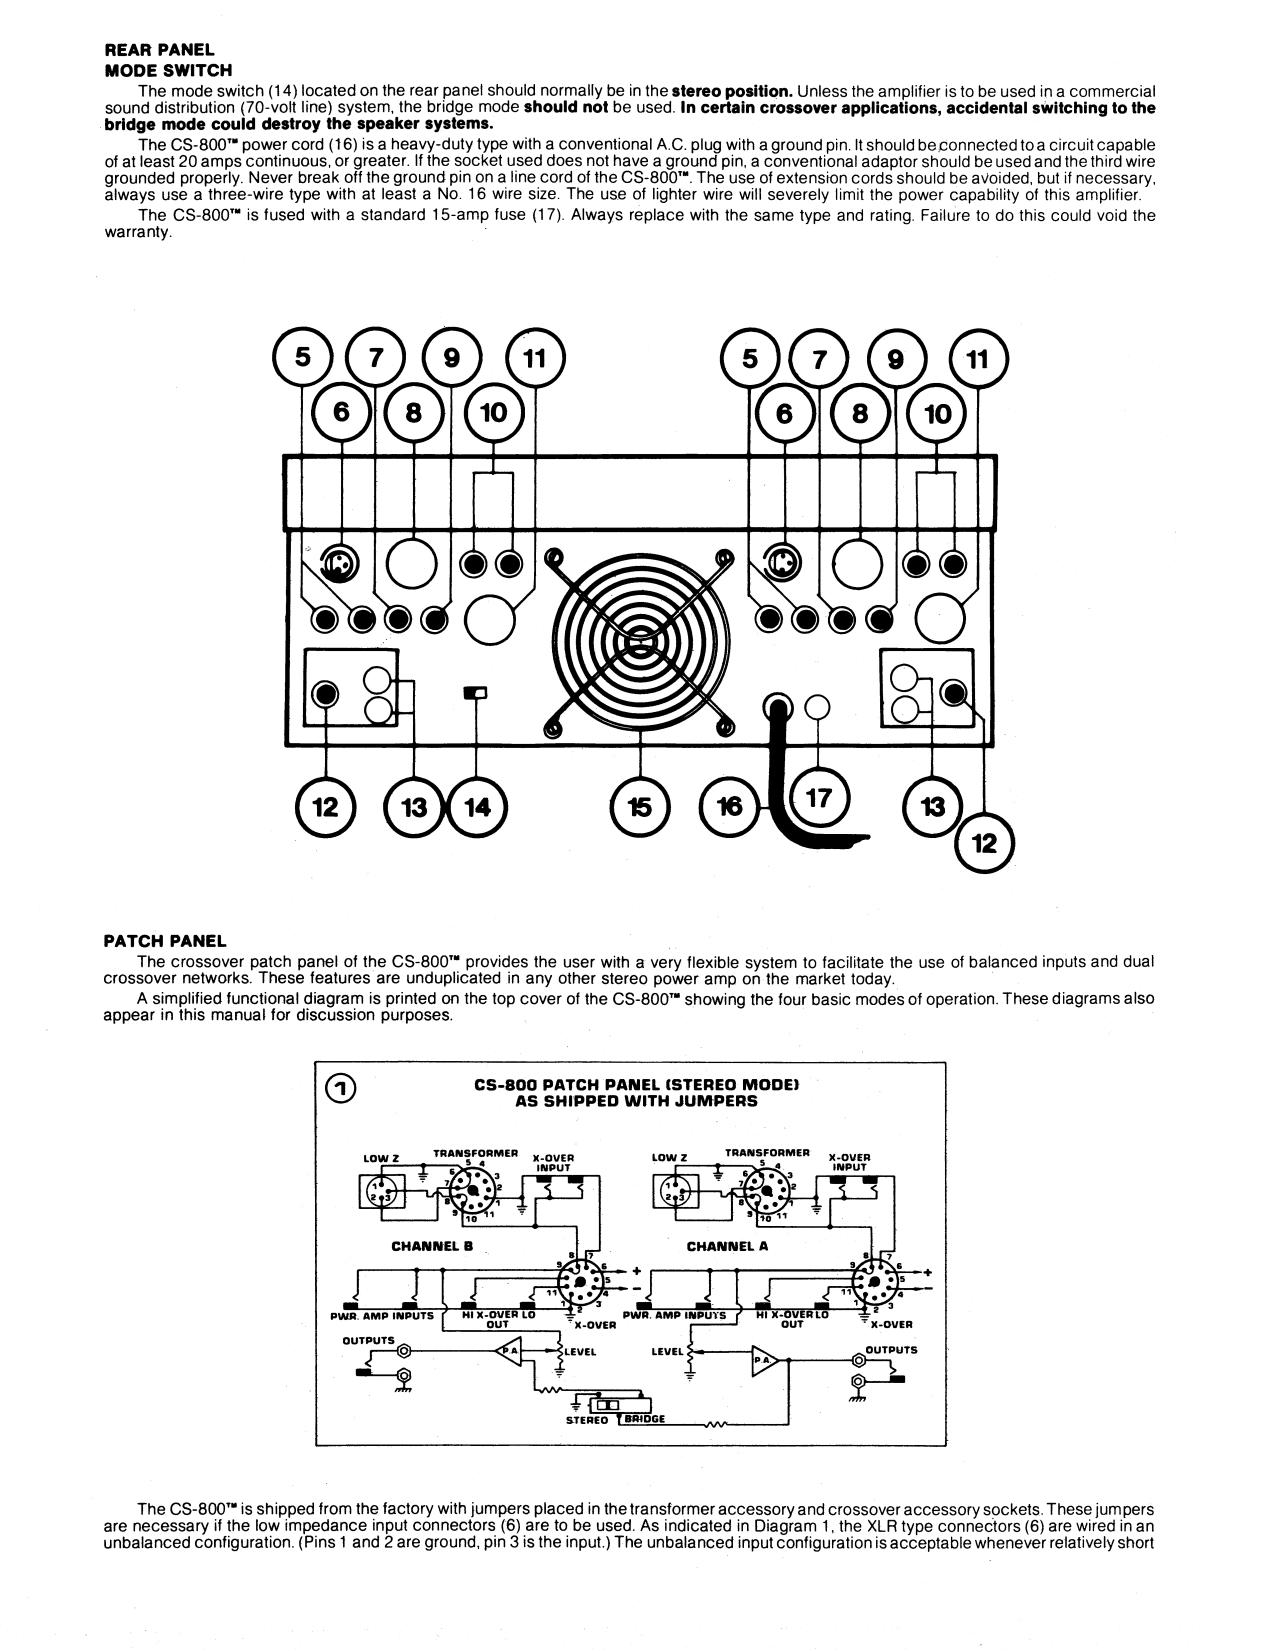 pdf manual for peavey amp cs 800 rh umlib com Peavey CS 800 Manual Amplificador Peavey CS800